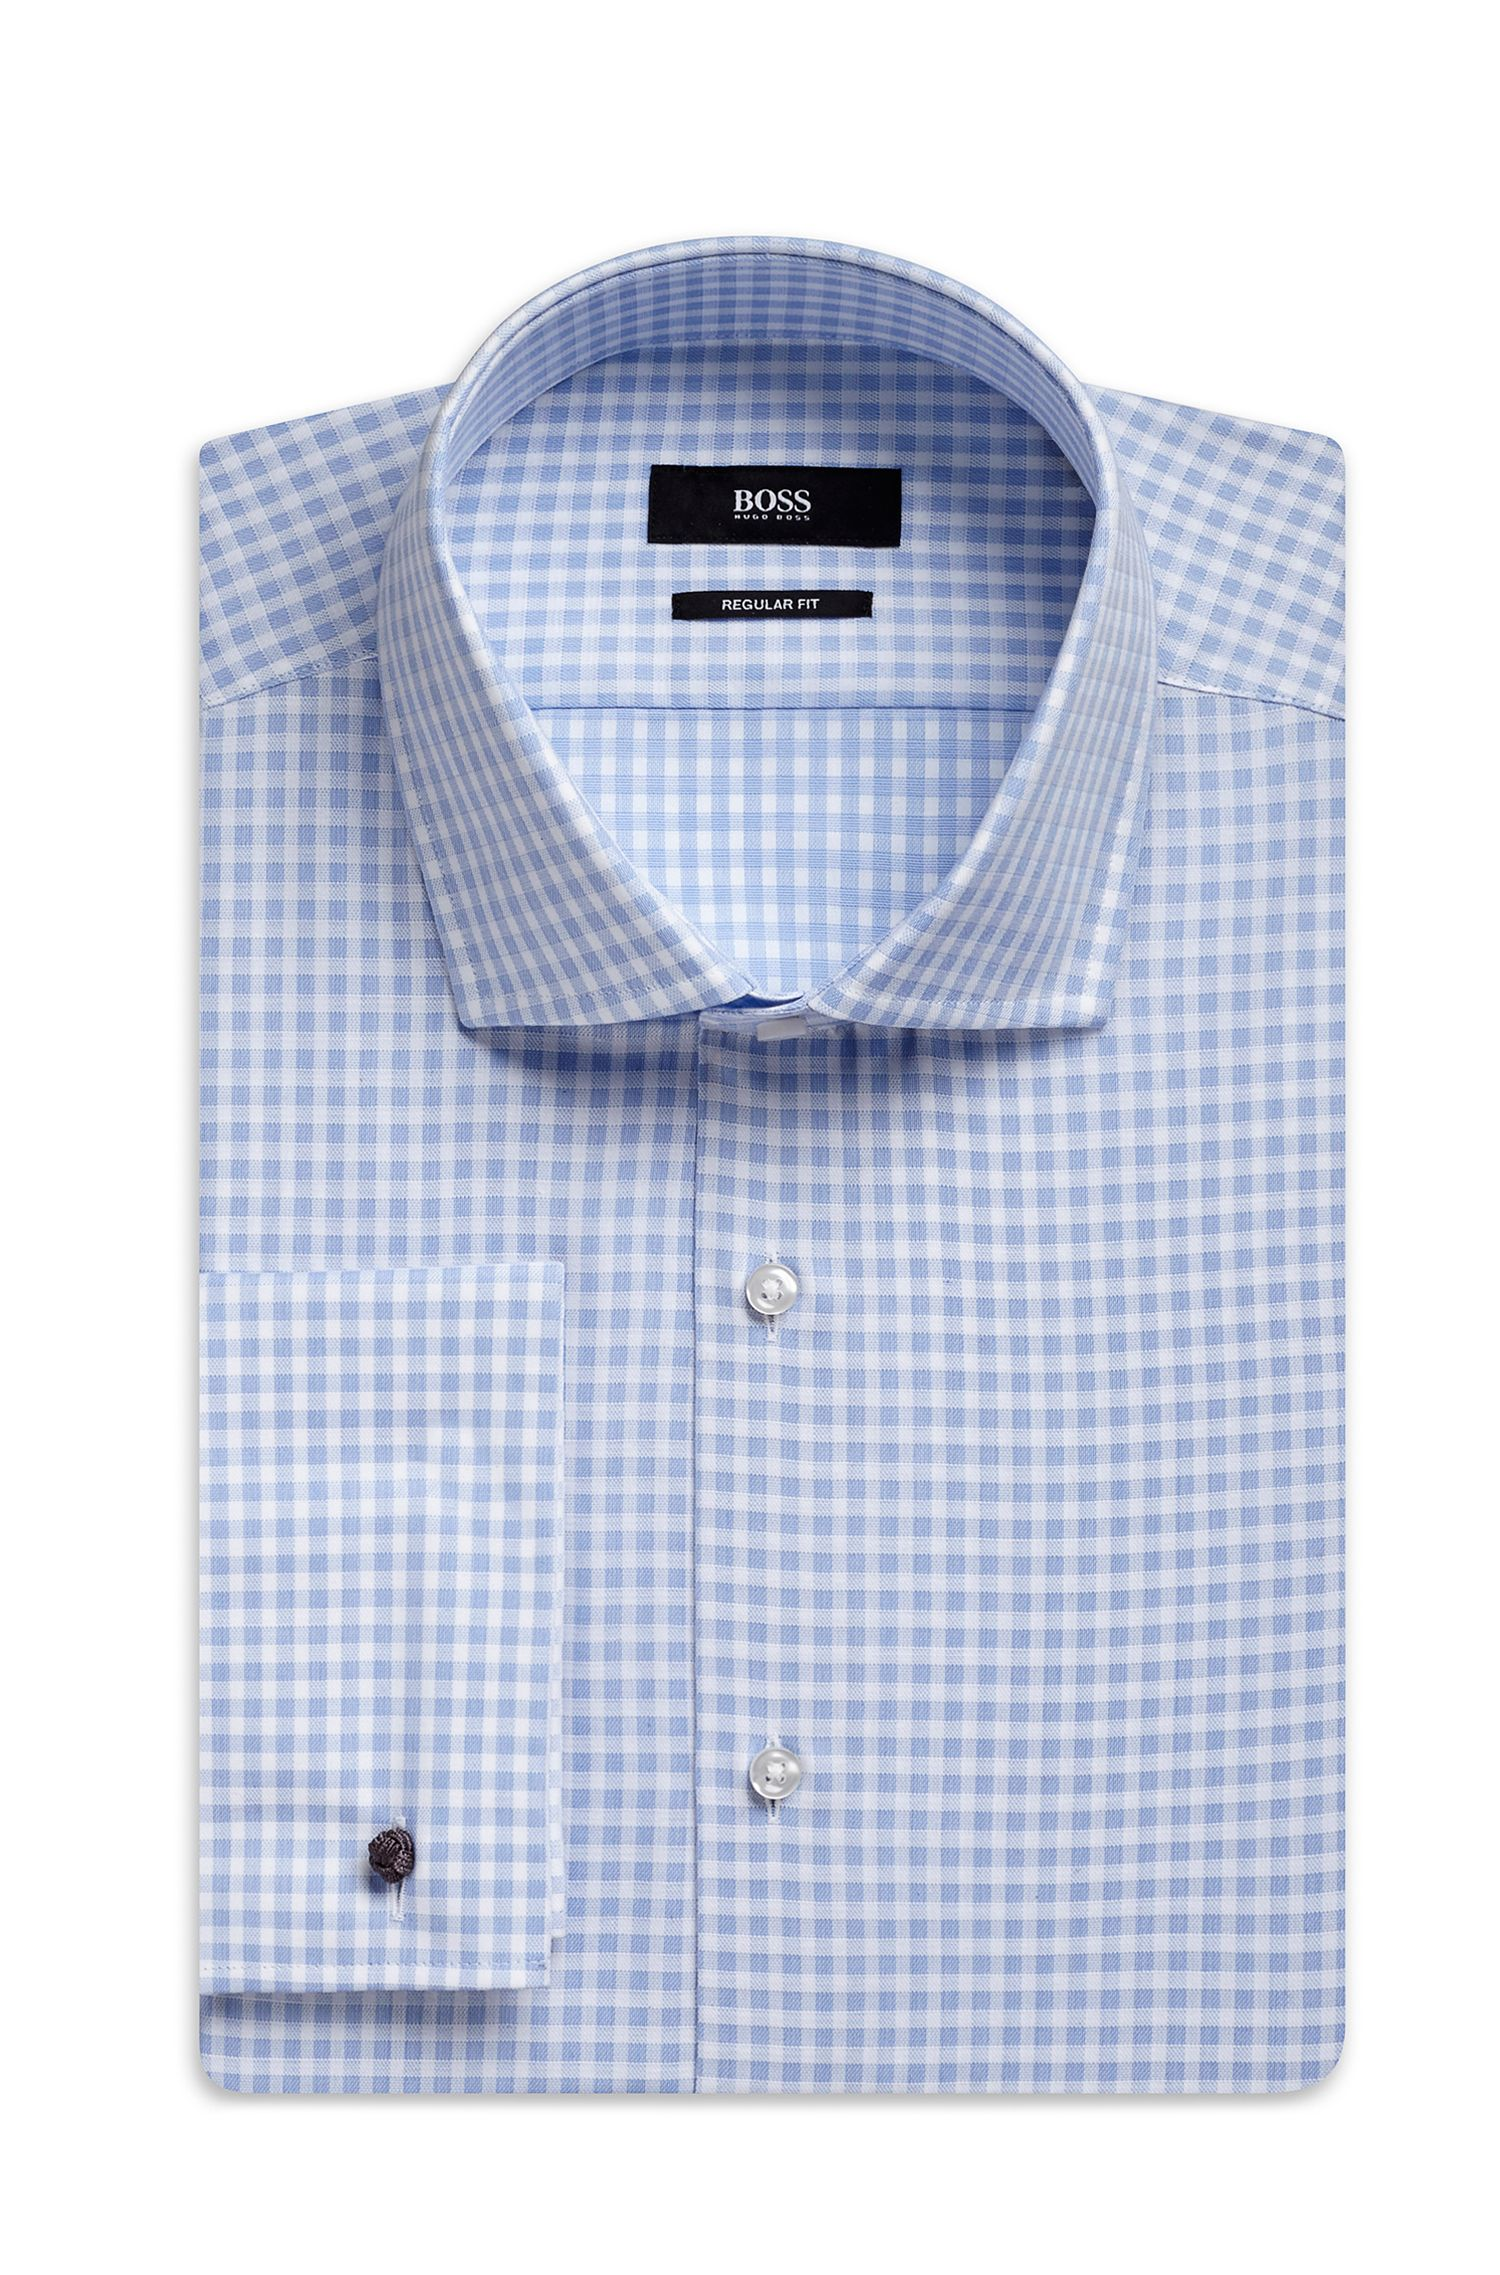 Gingham Italian Cotton Dress Shirt, Regular Fit  Gardner